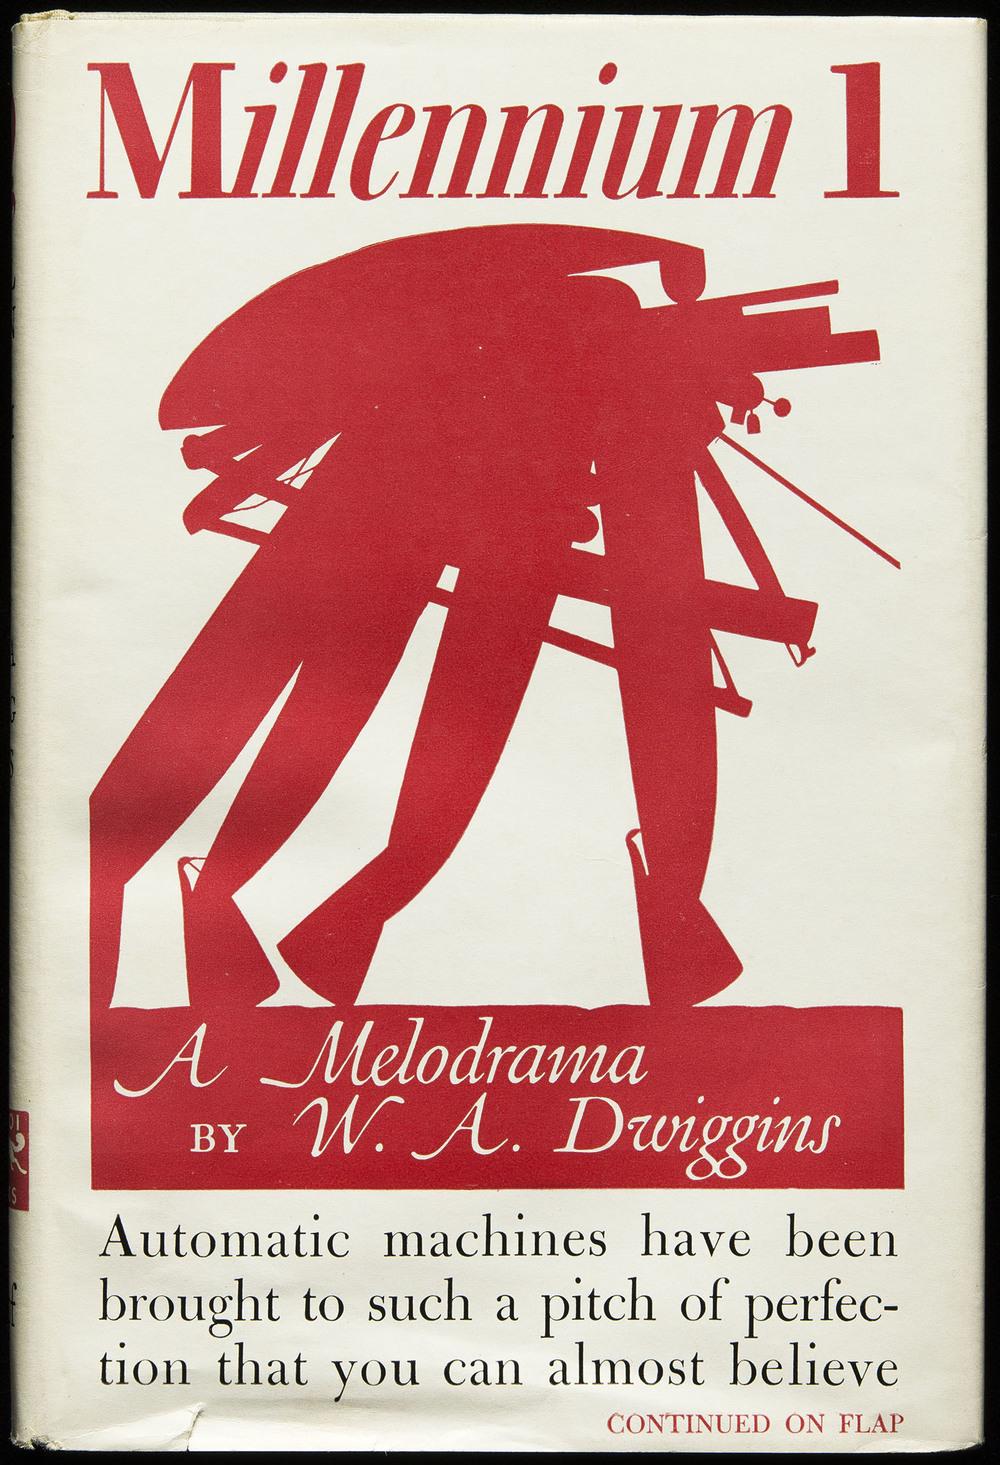 Millenium 1 , Knopf, New York, 1945, 12.2 x 18.1 cm